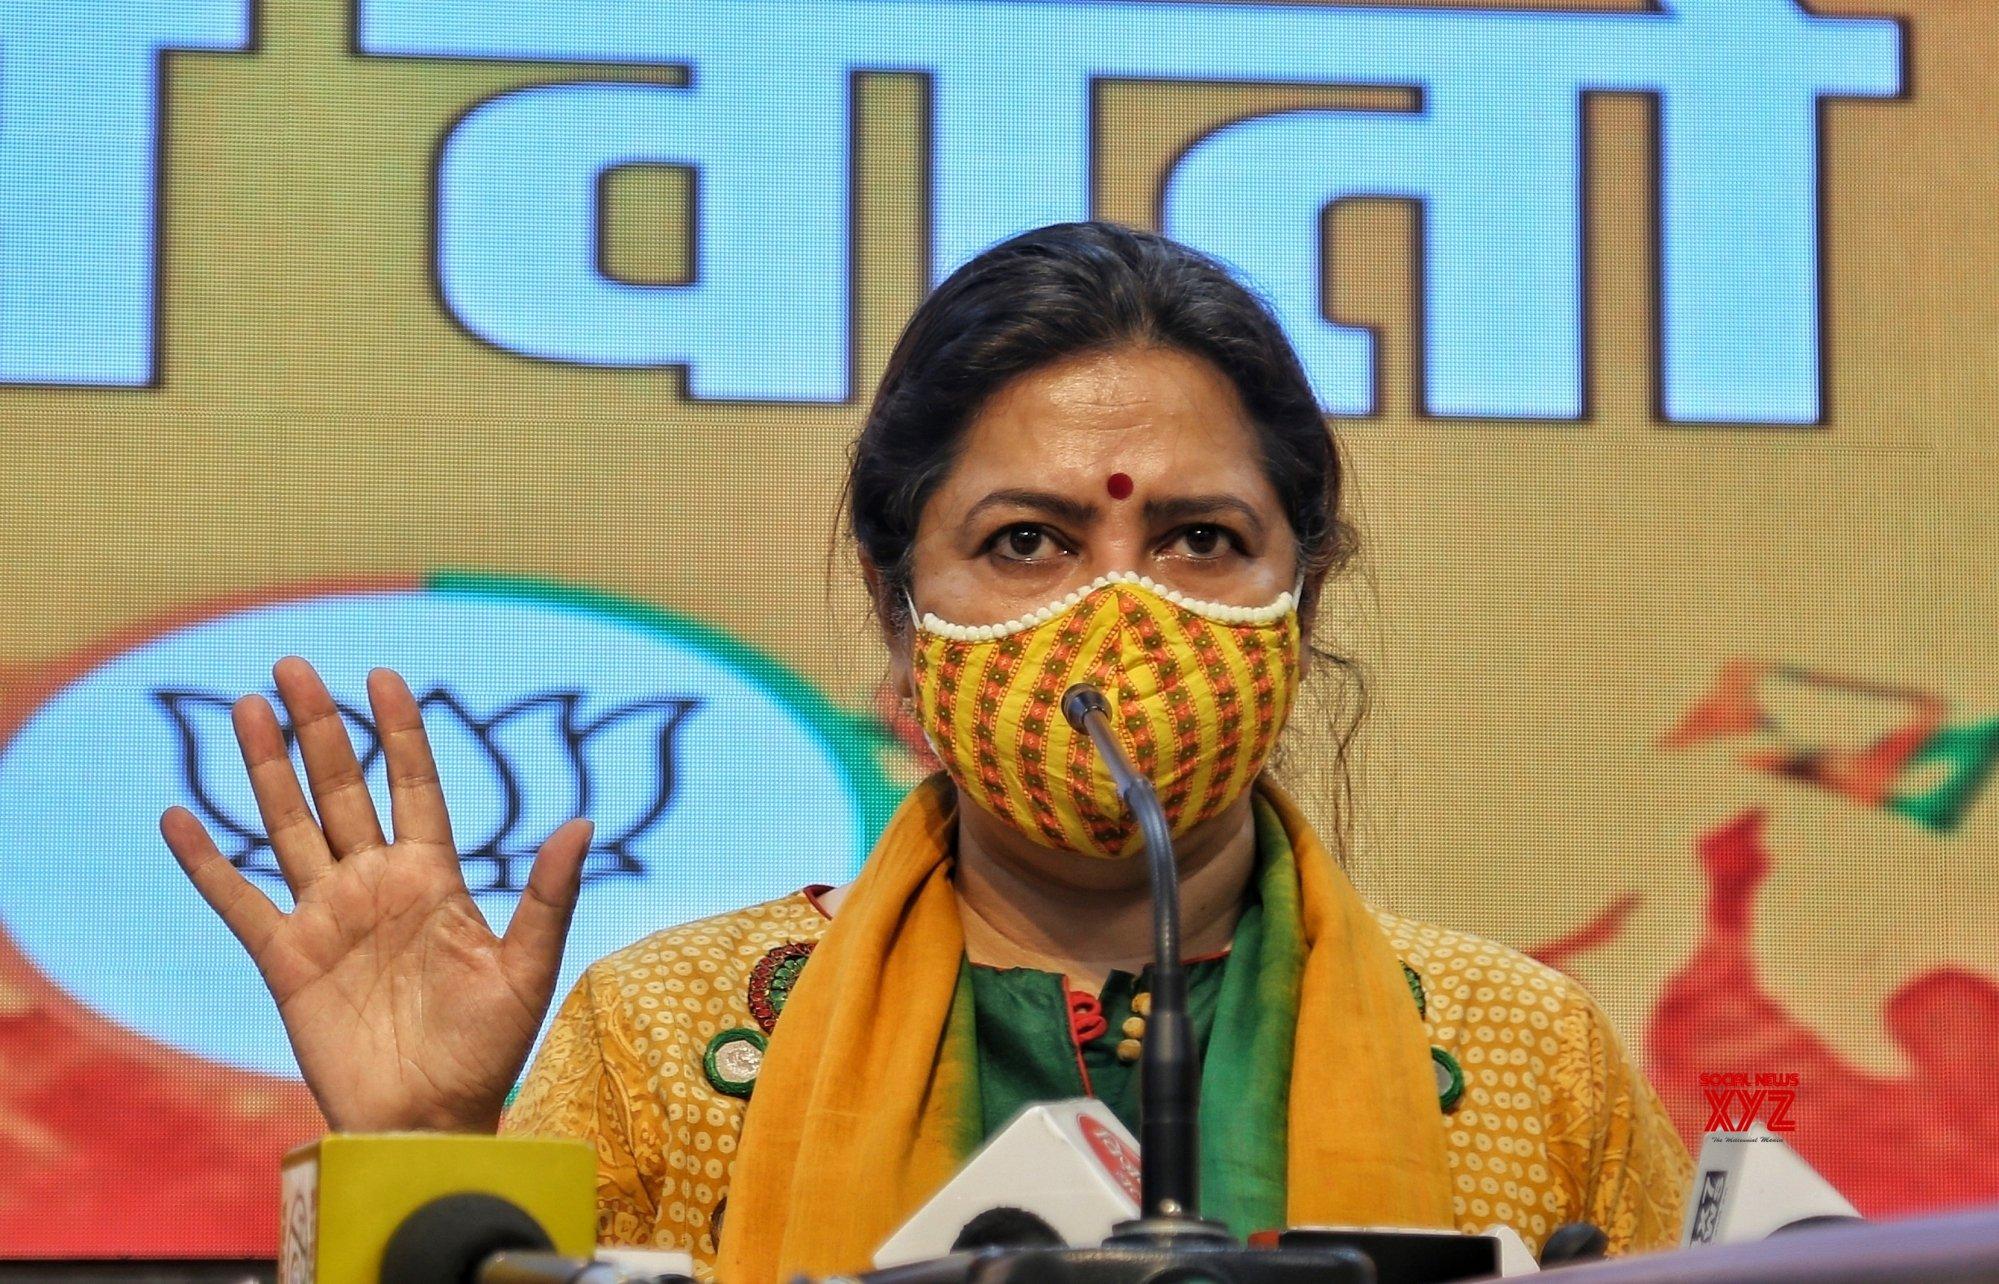 New Delhi : BJP leader and MP Meenakshi Lekhi - address a press conference in New Delhi. #Gallery